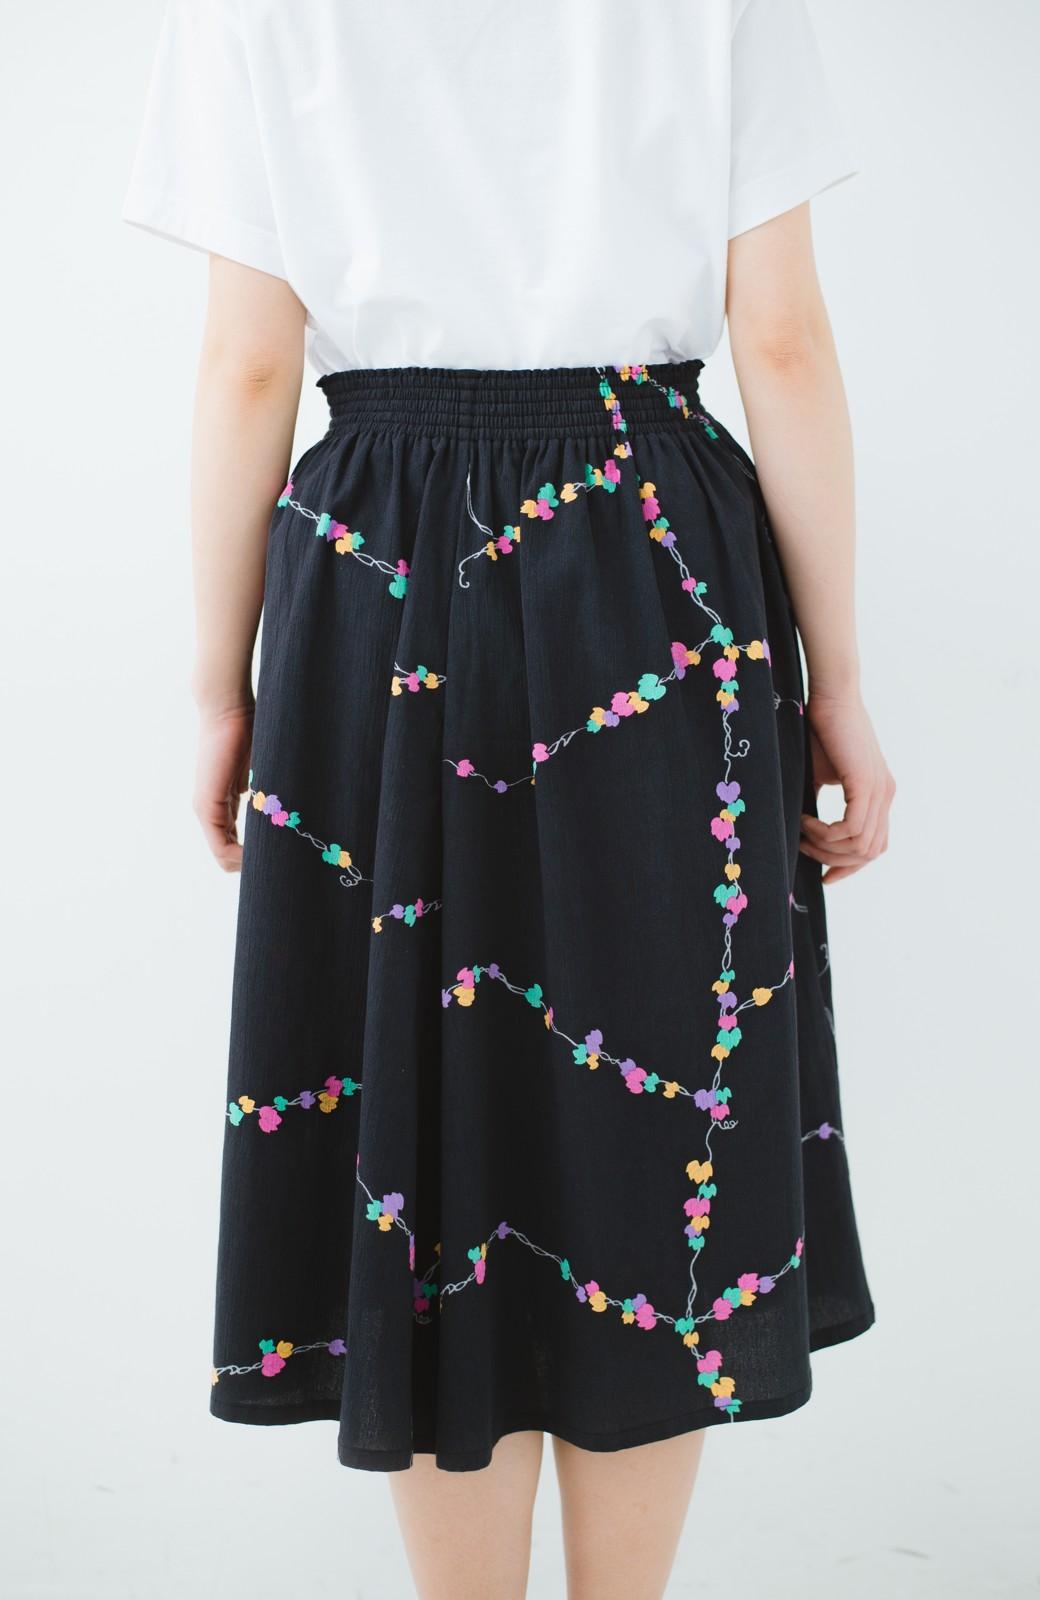 haco! 京都の浴衣屋さんと作った浴衣生地のスカート <ブラック系その他>の商品写真9